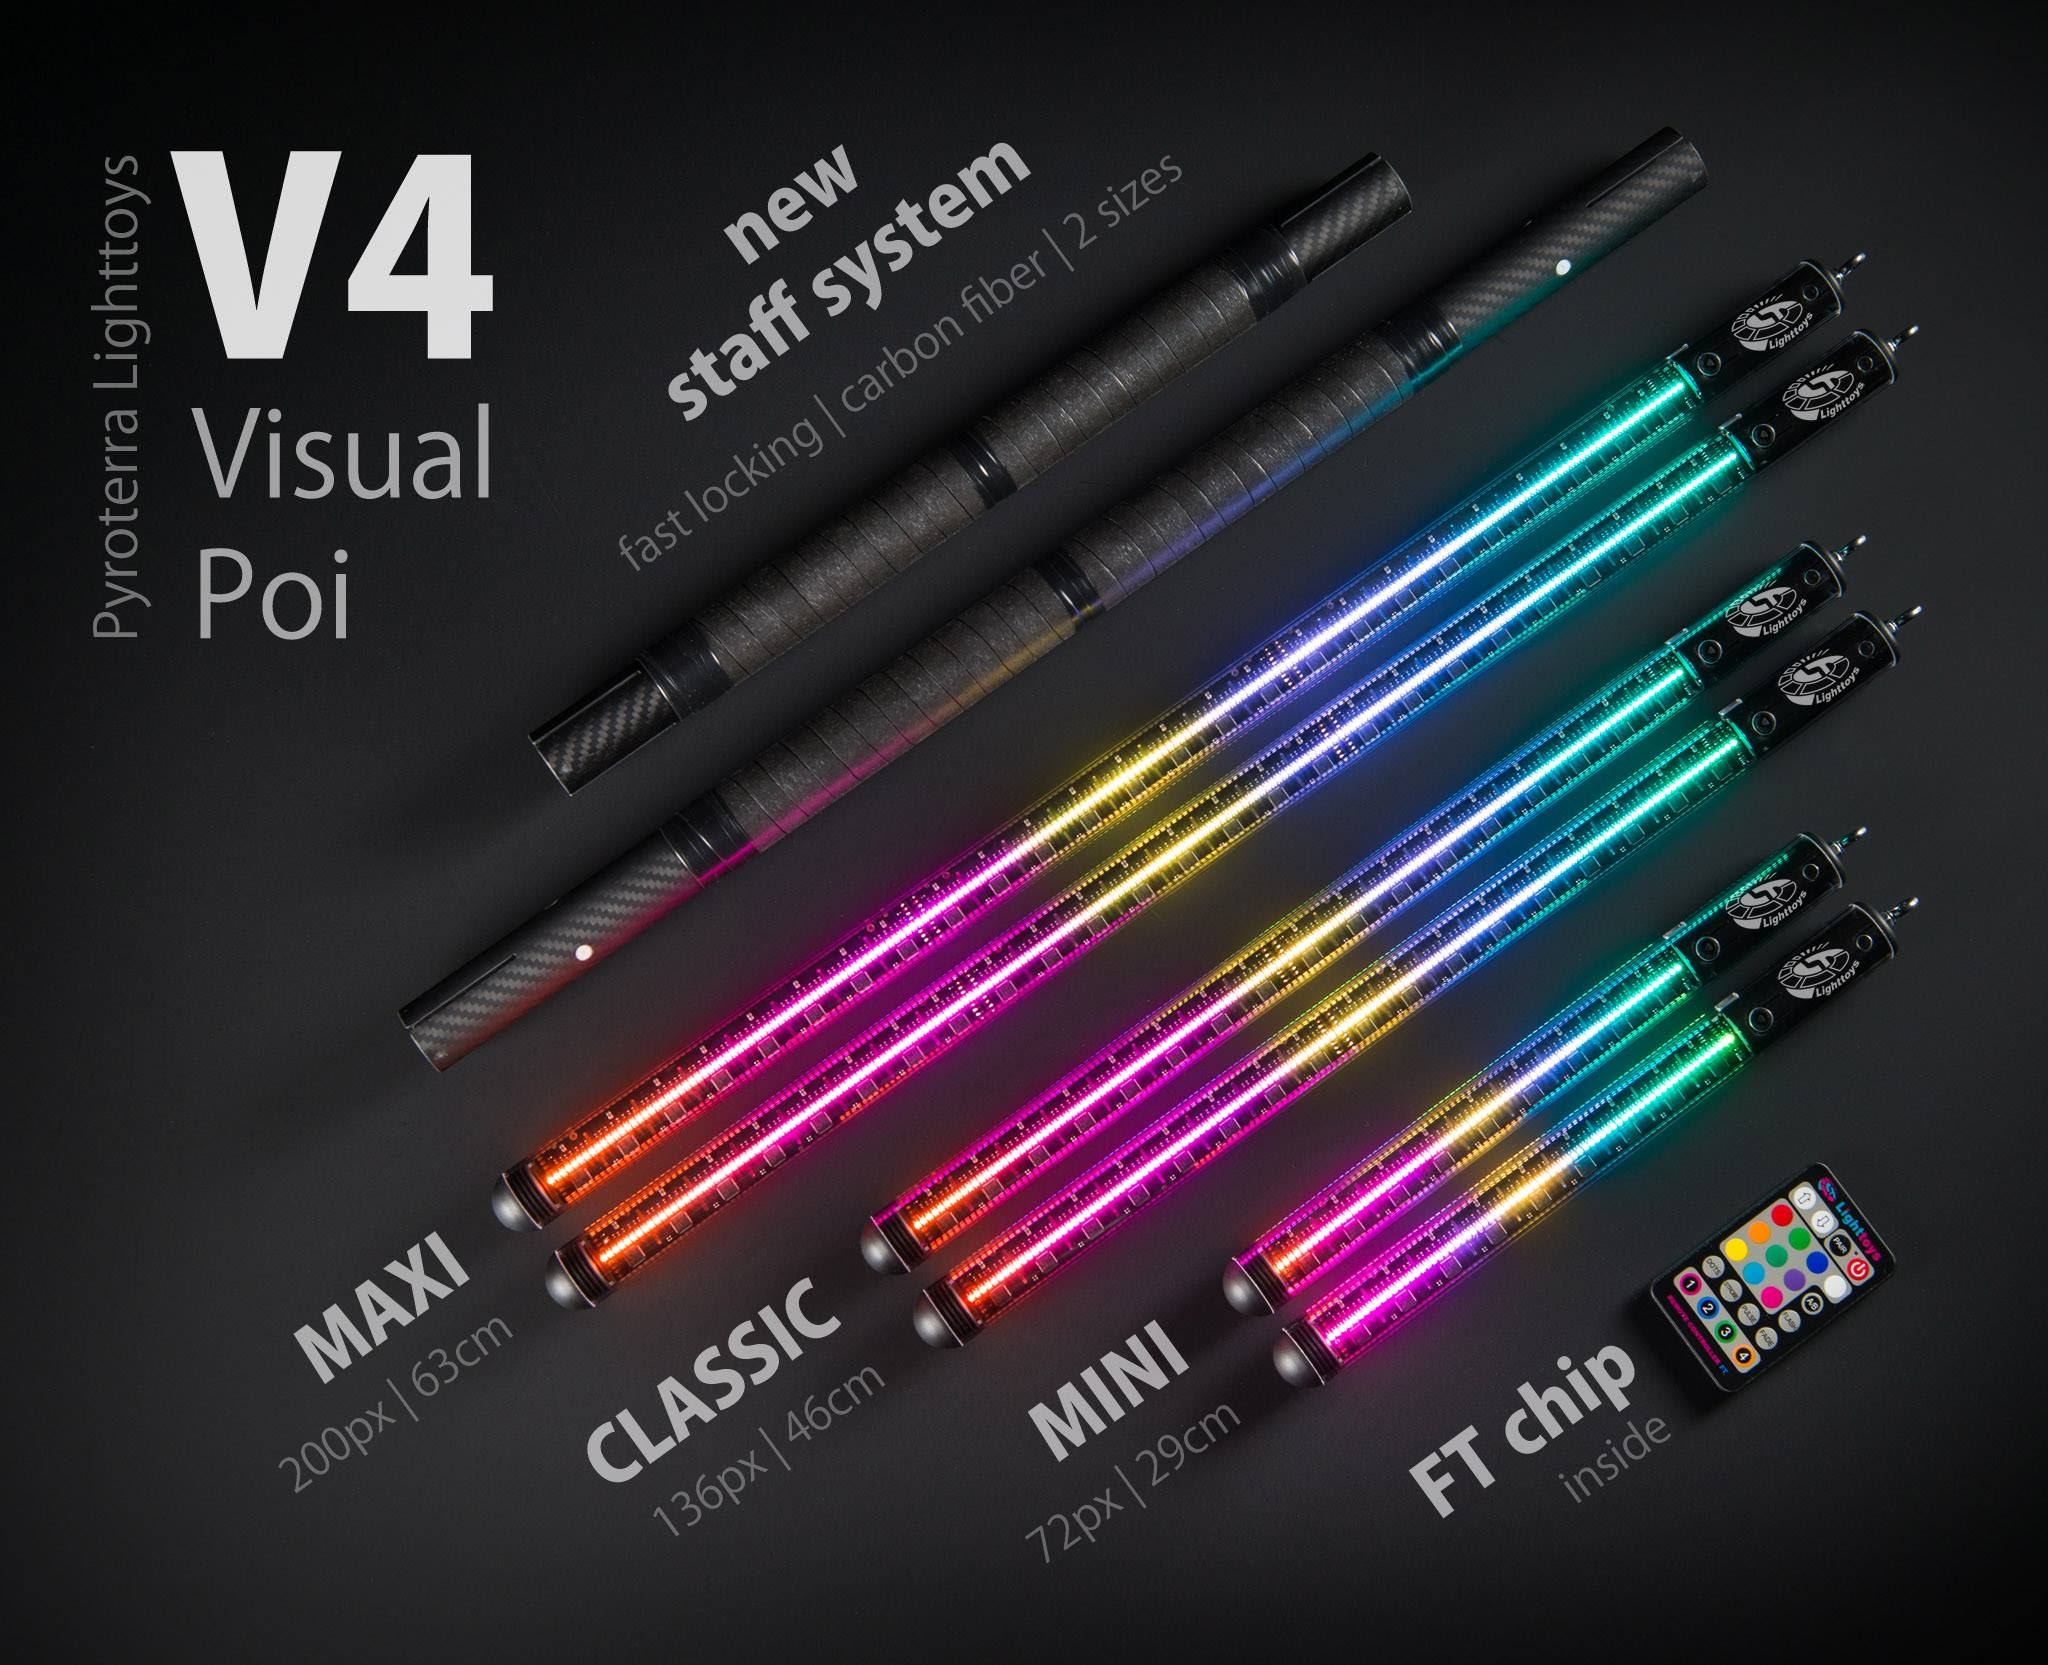 Visual Poi V4